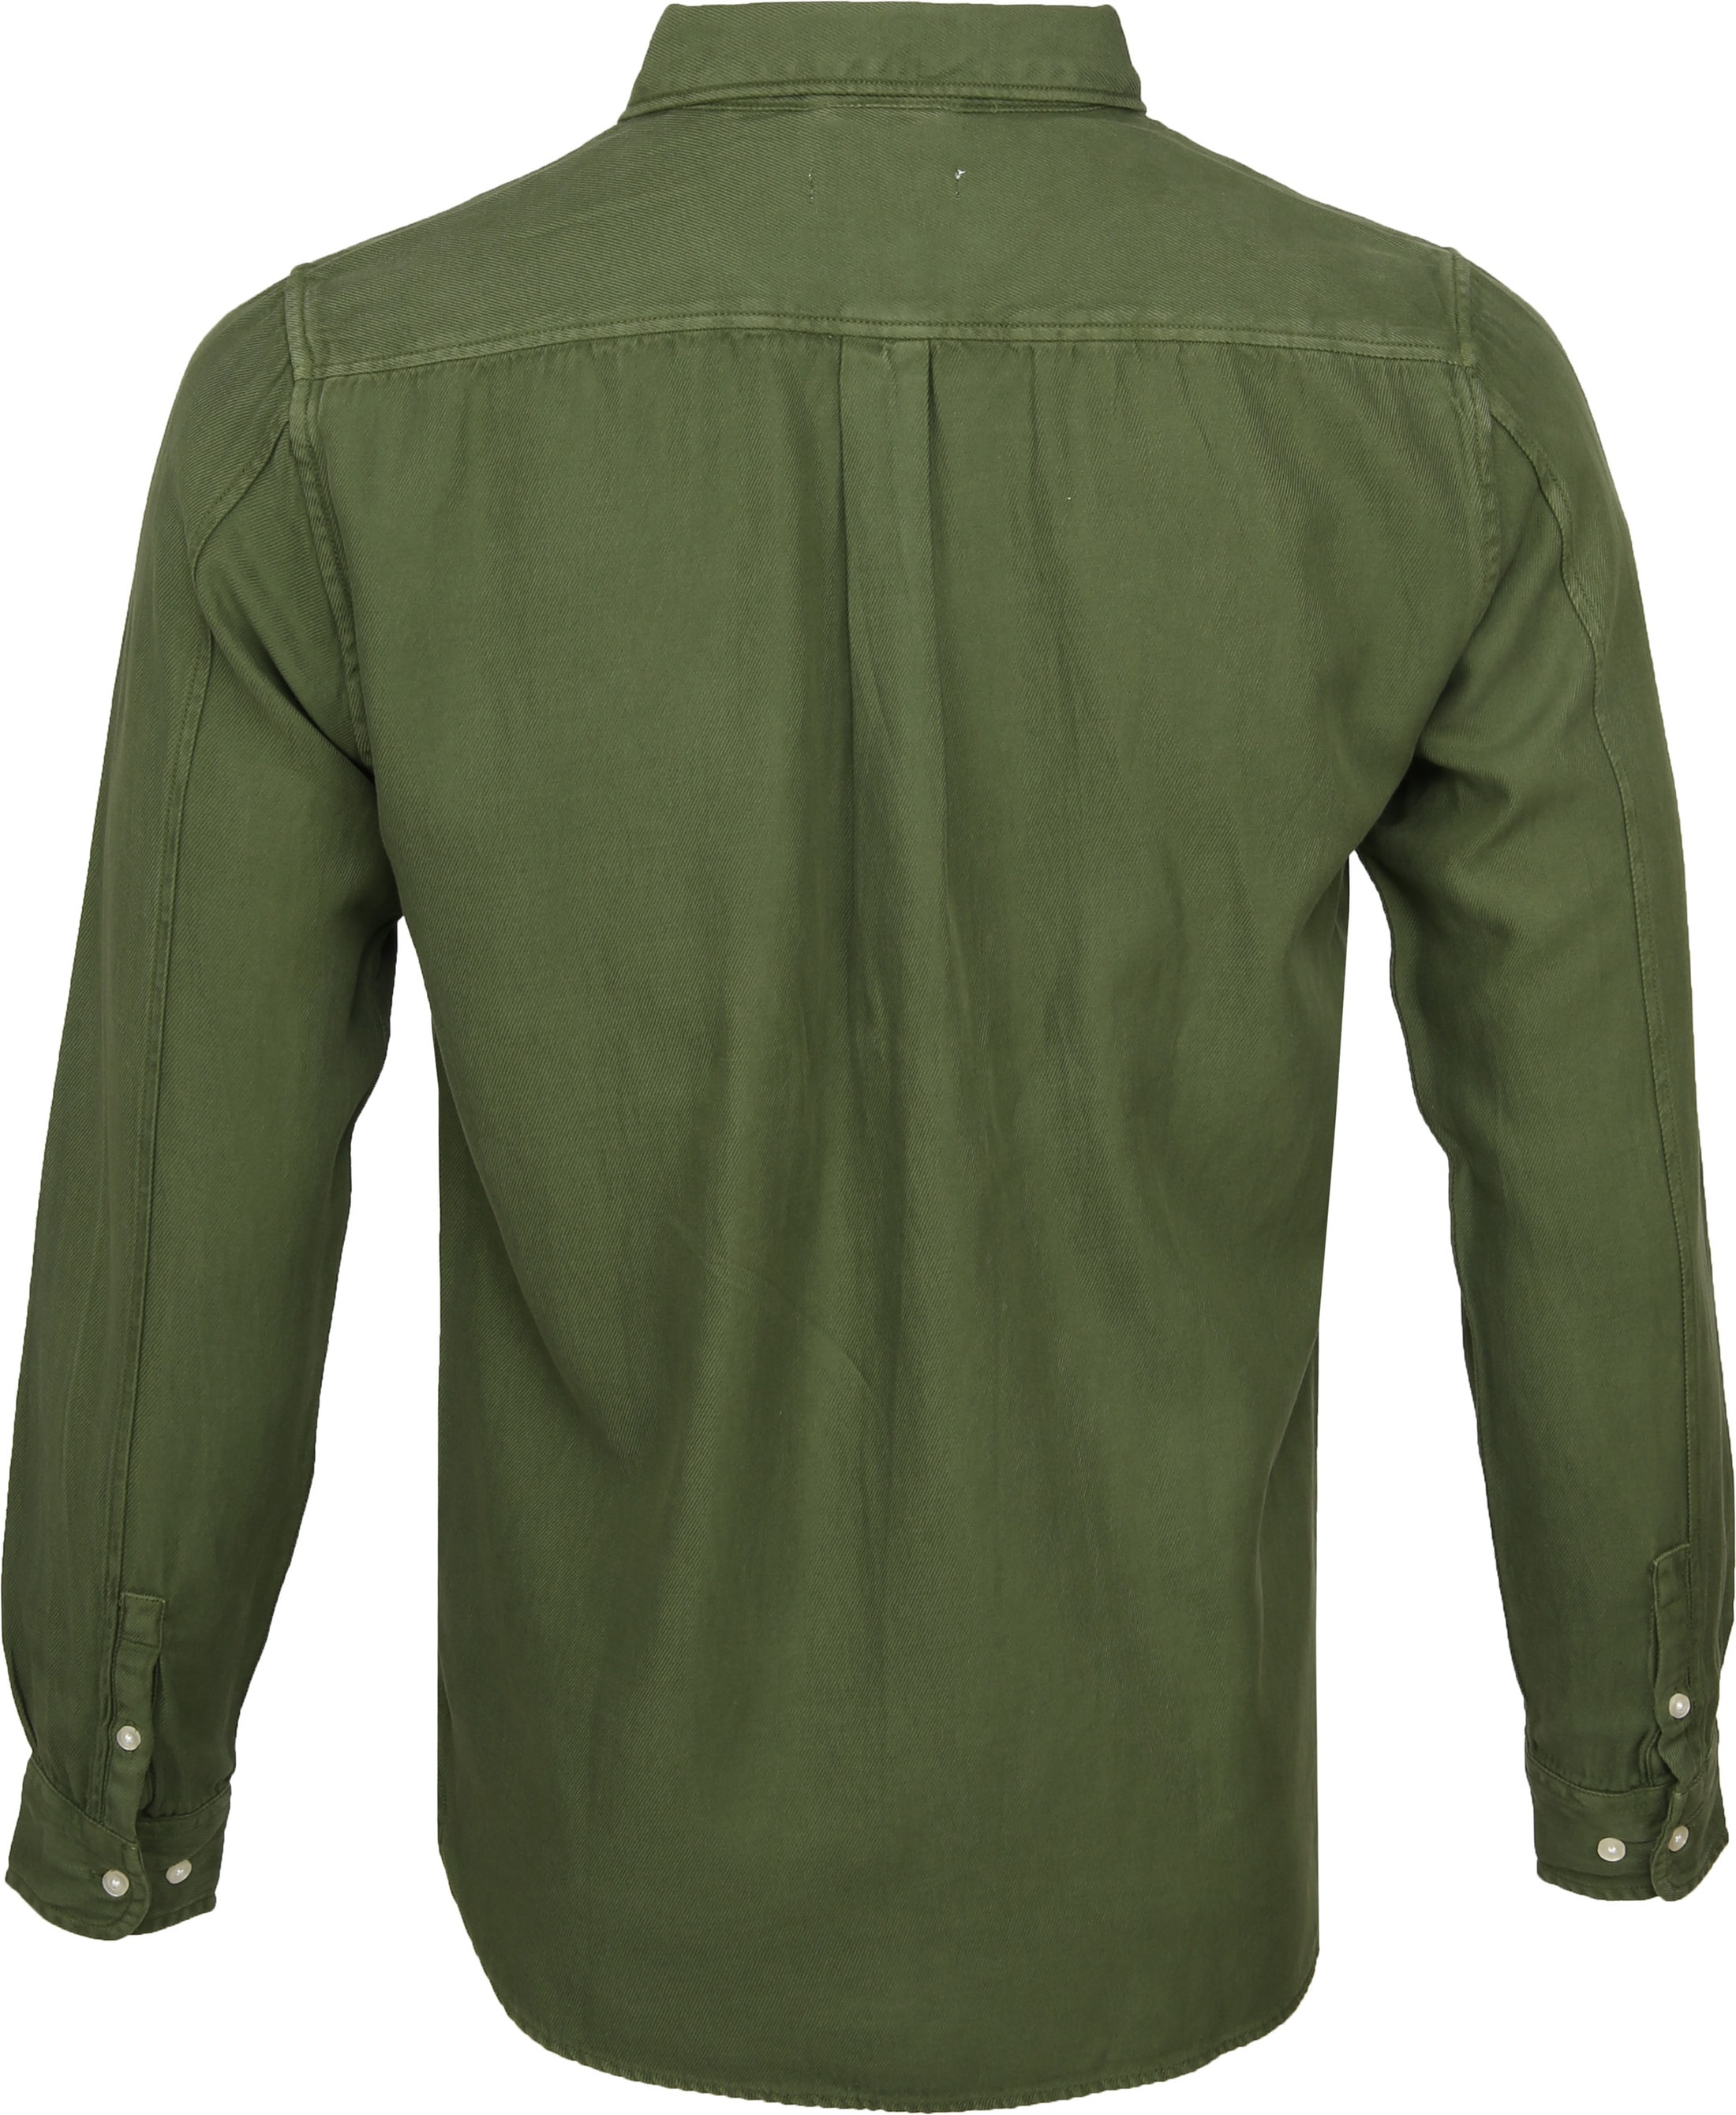 KnowledgeCotton Apparel Shirt Twill Green photo 3